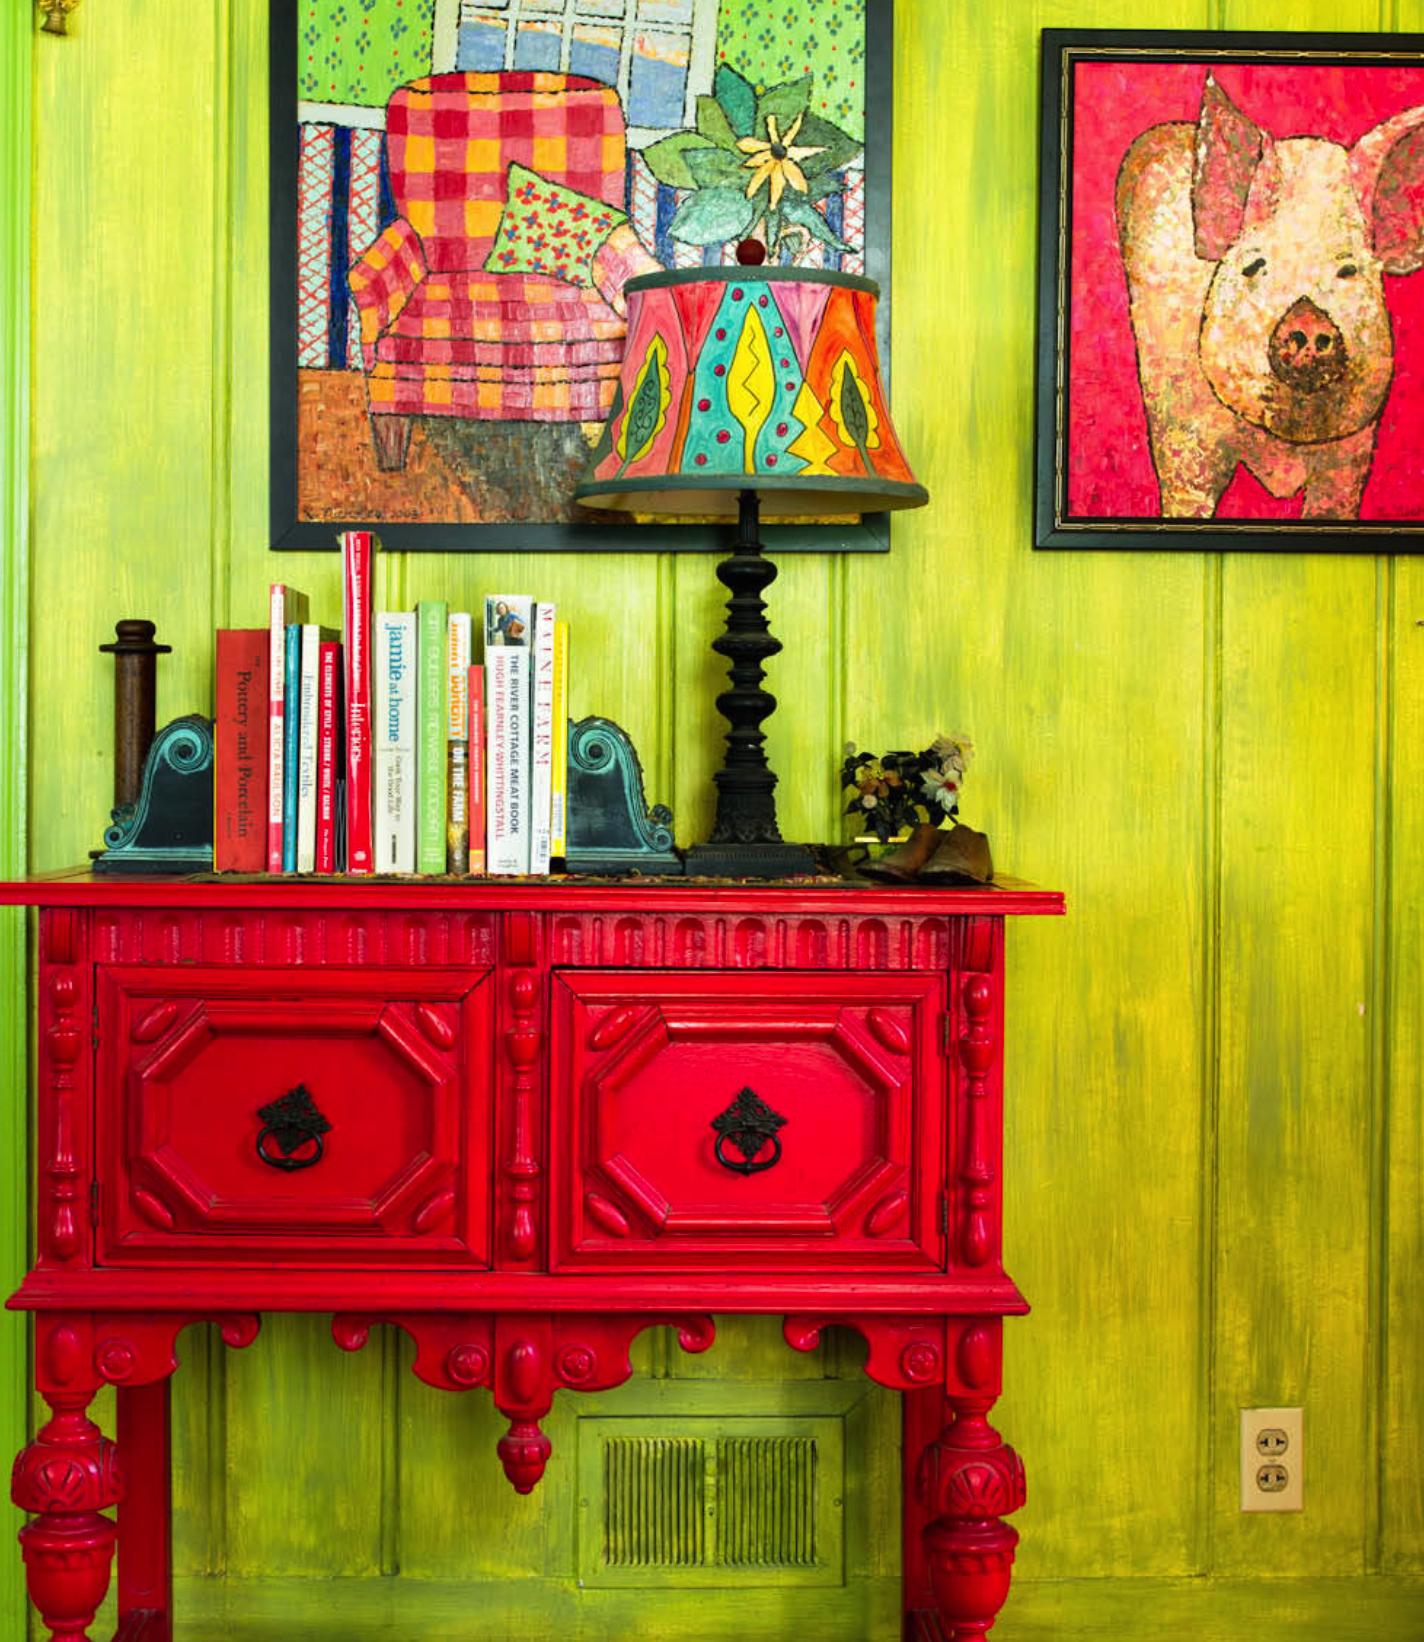 daa65d35909c48cbef3bf7716b01b545 Boho Bedroom Decorating Ideas Dark Wood And Floors on